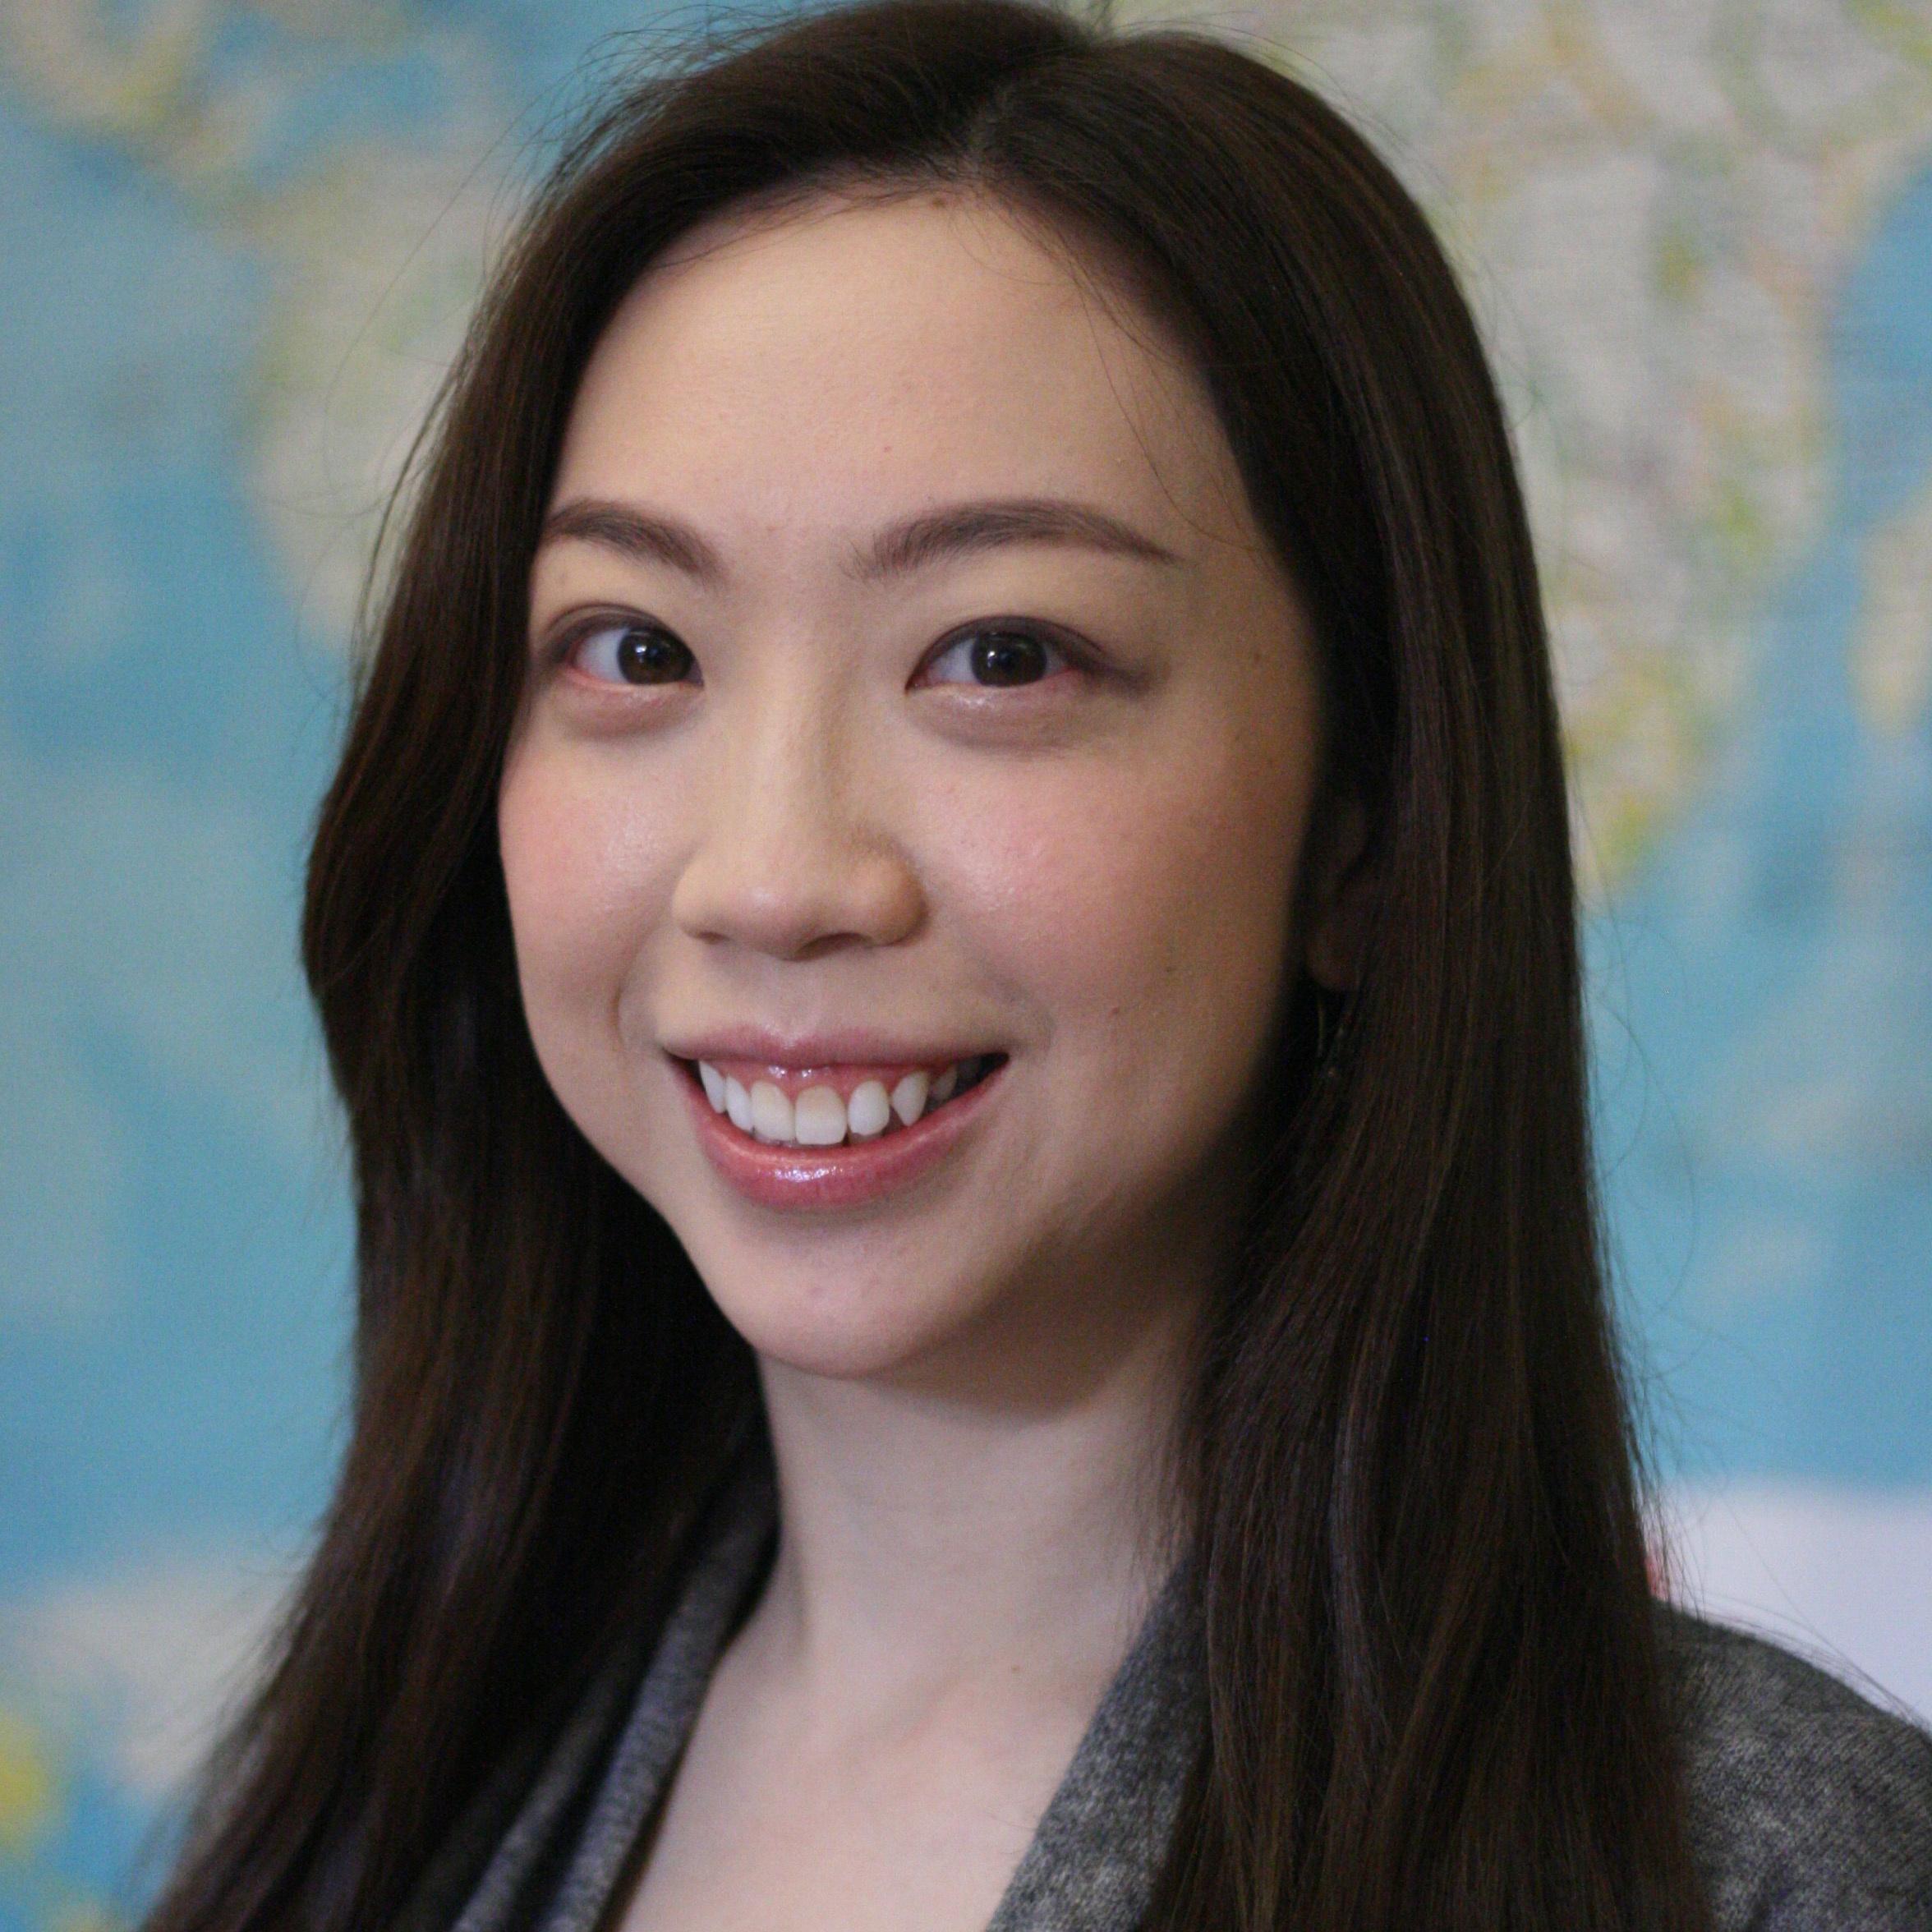 Eliza Yee Lai Cheung